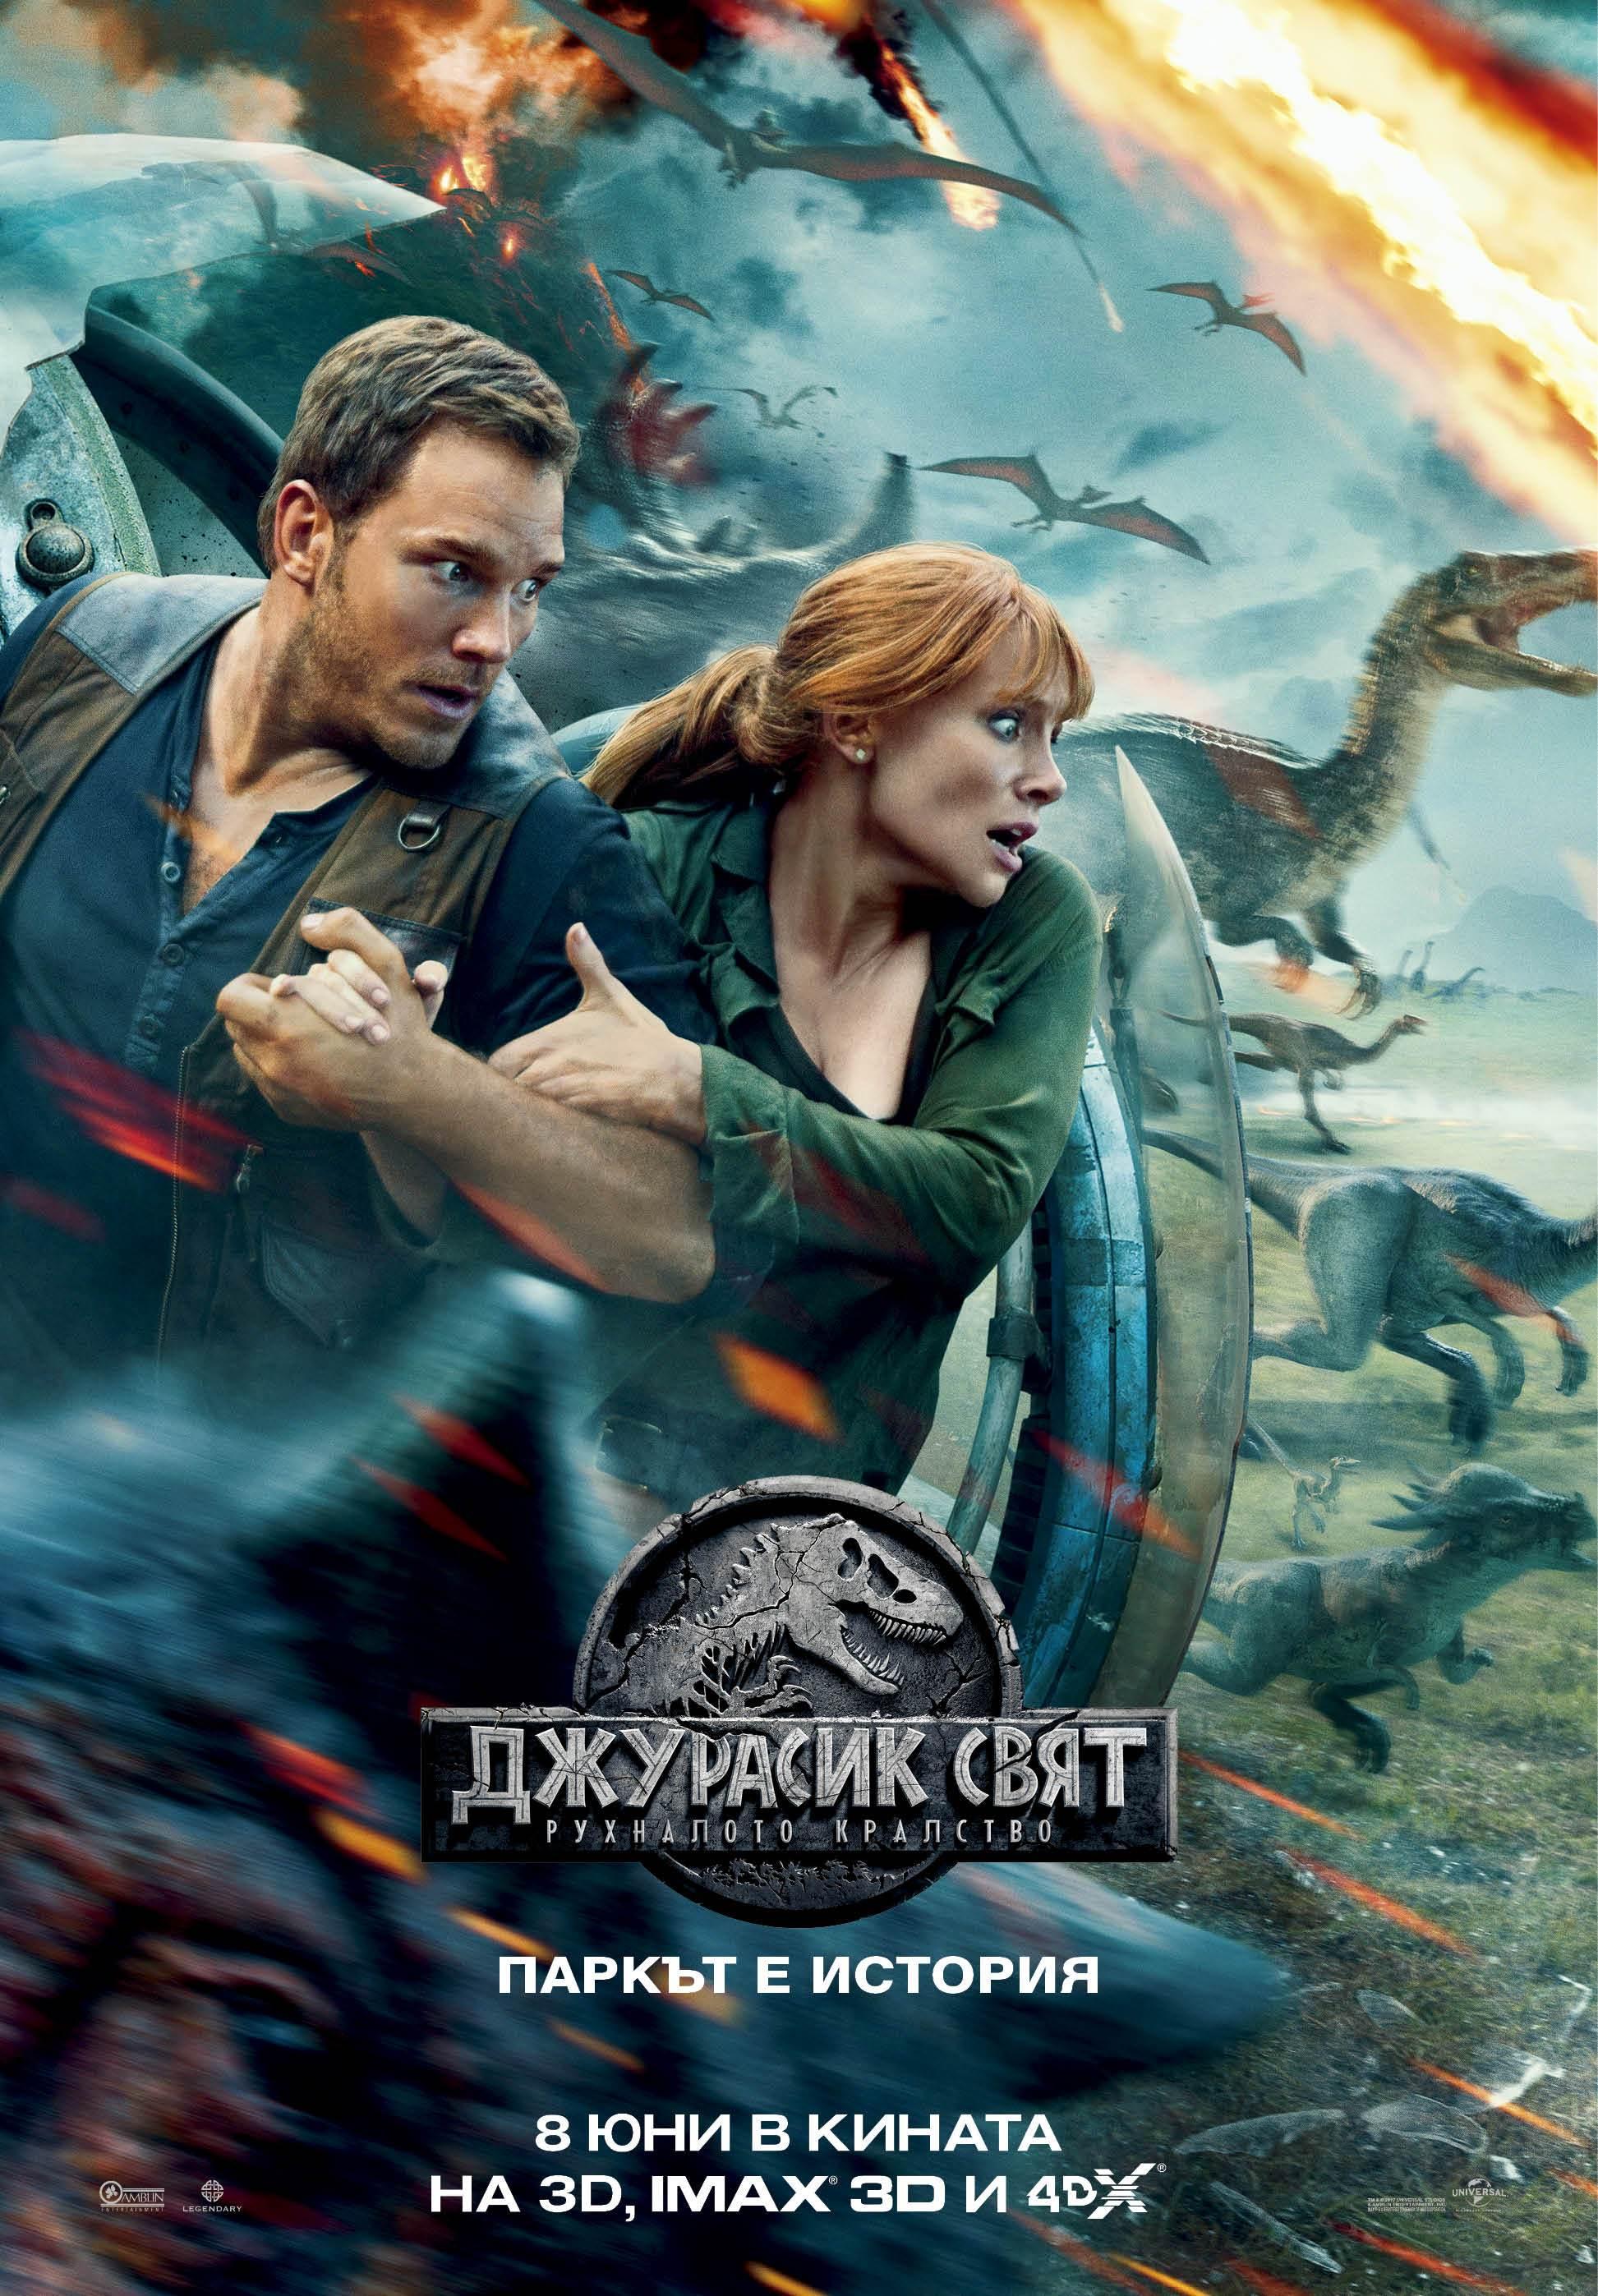 Jurassic World: Fallen Kingdom / Джурасик свят: Рухналото кралство (2018)